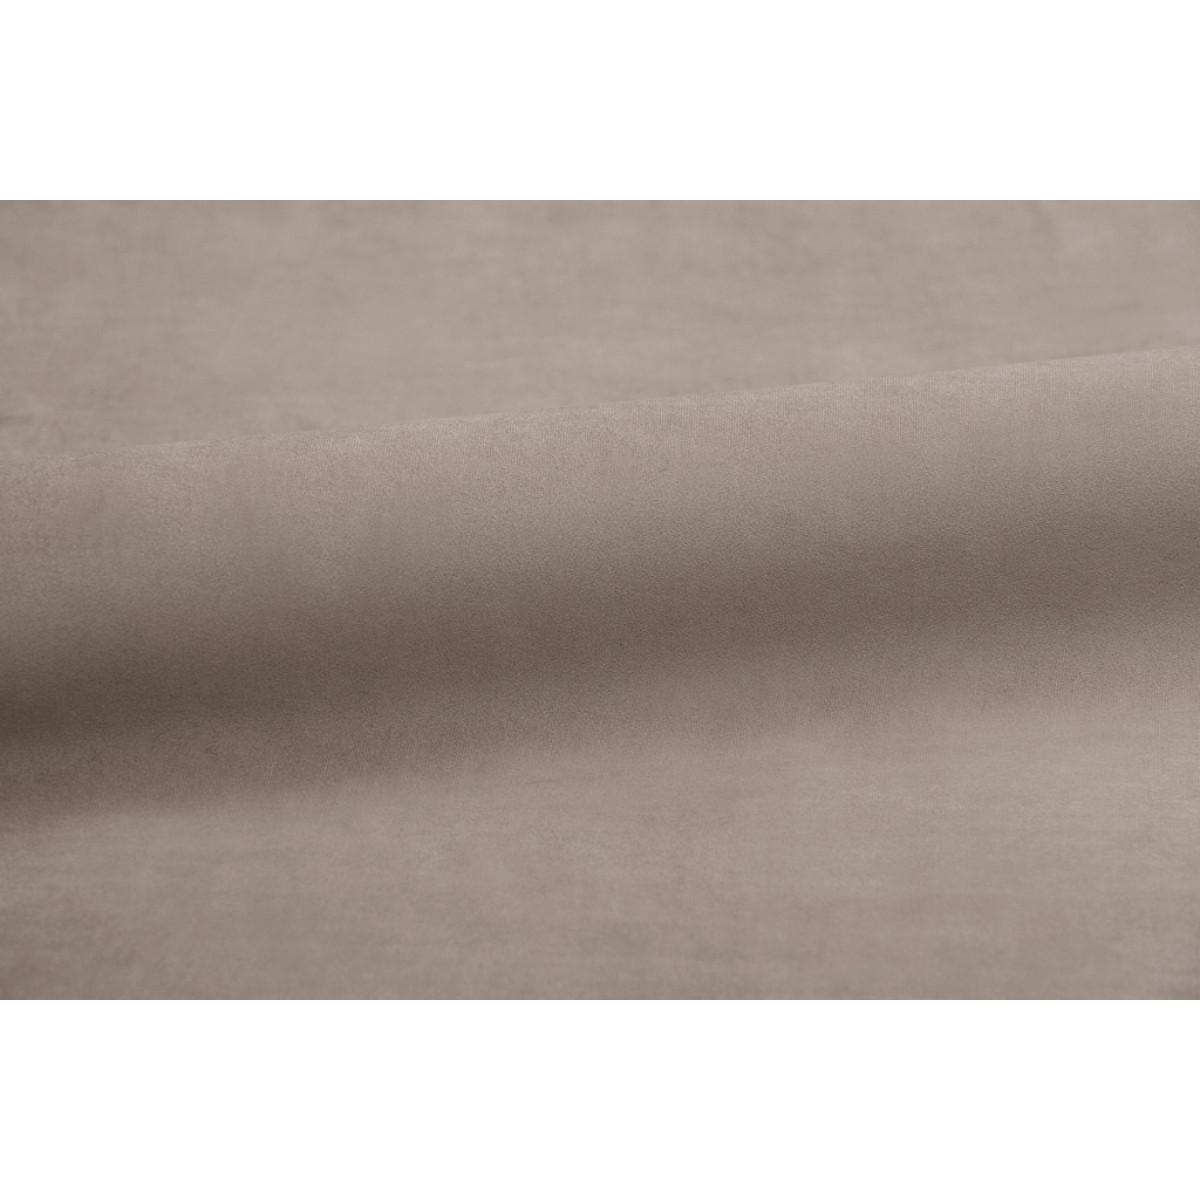 C02-K03-BG-B05 Стул коллекция Sophora